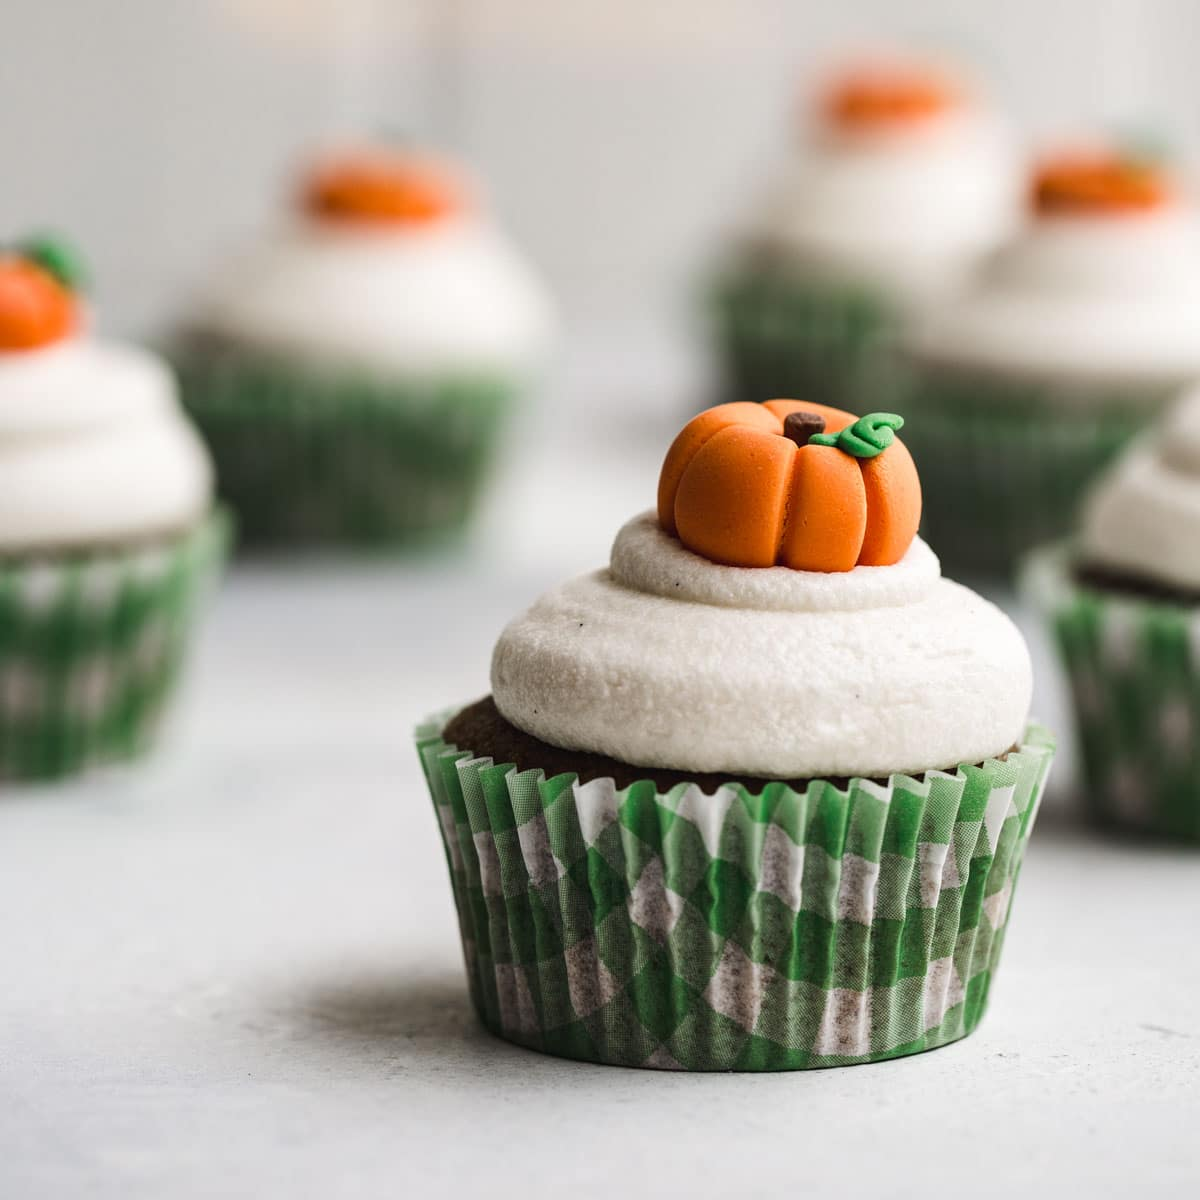 A cupcake with a pumpkin topper.